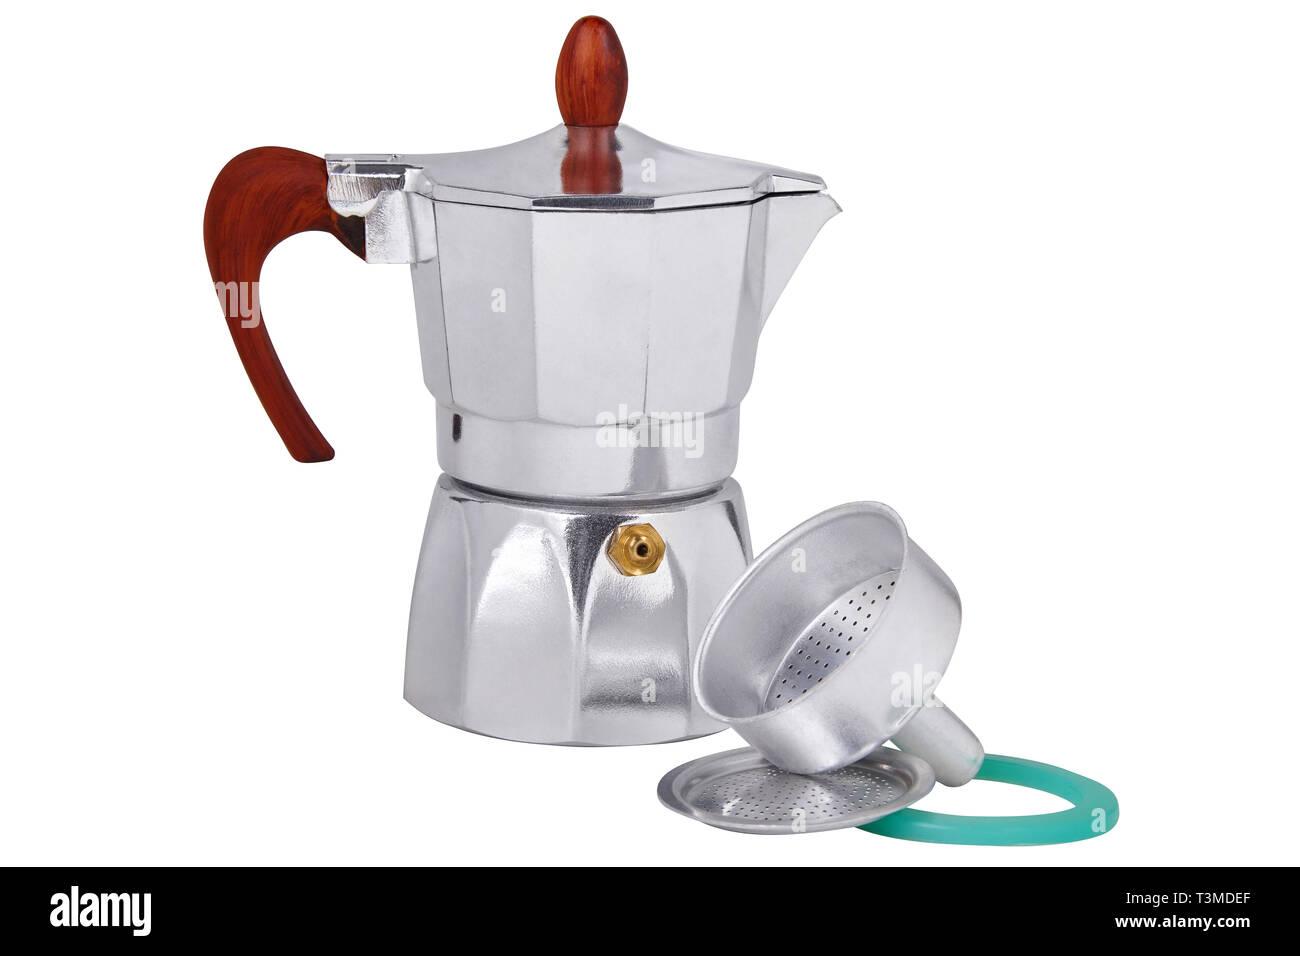 El géiser metálicos cafetera, cafetera aislado sobre fondo